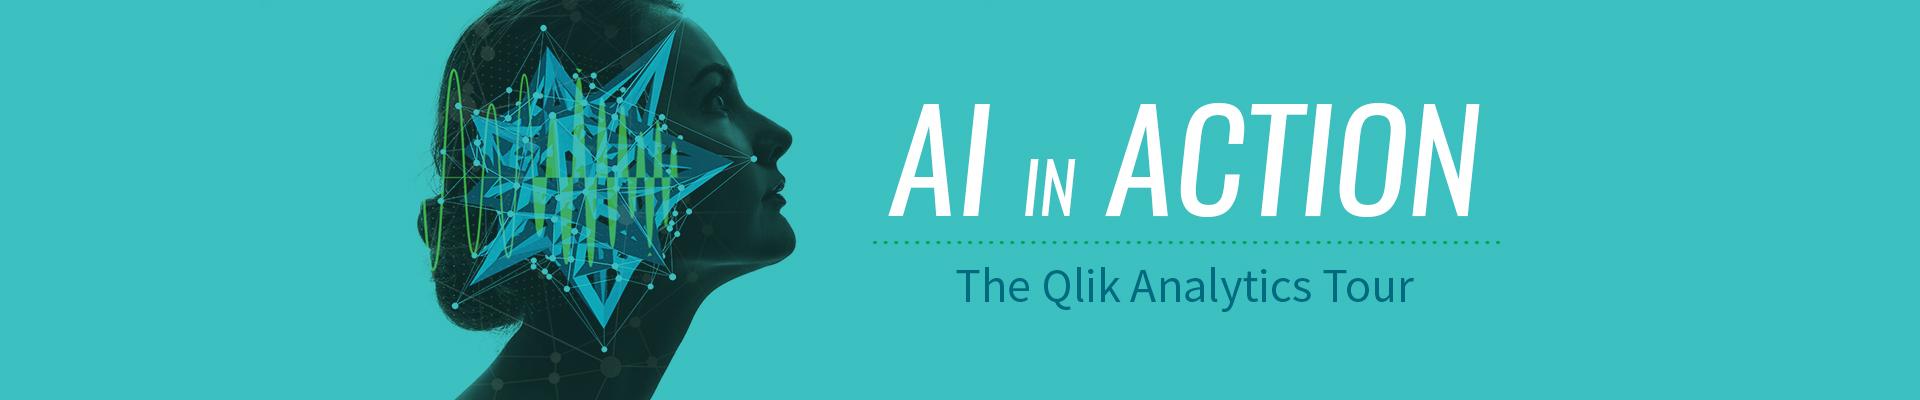 Qlik-Analytics-Tour_LP-Banner_V1A